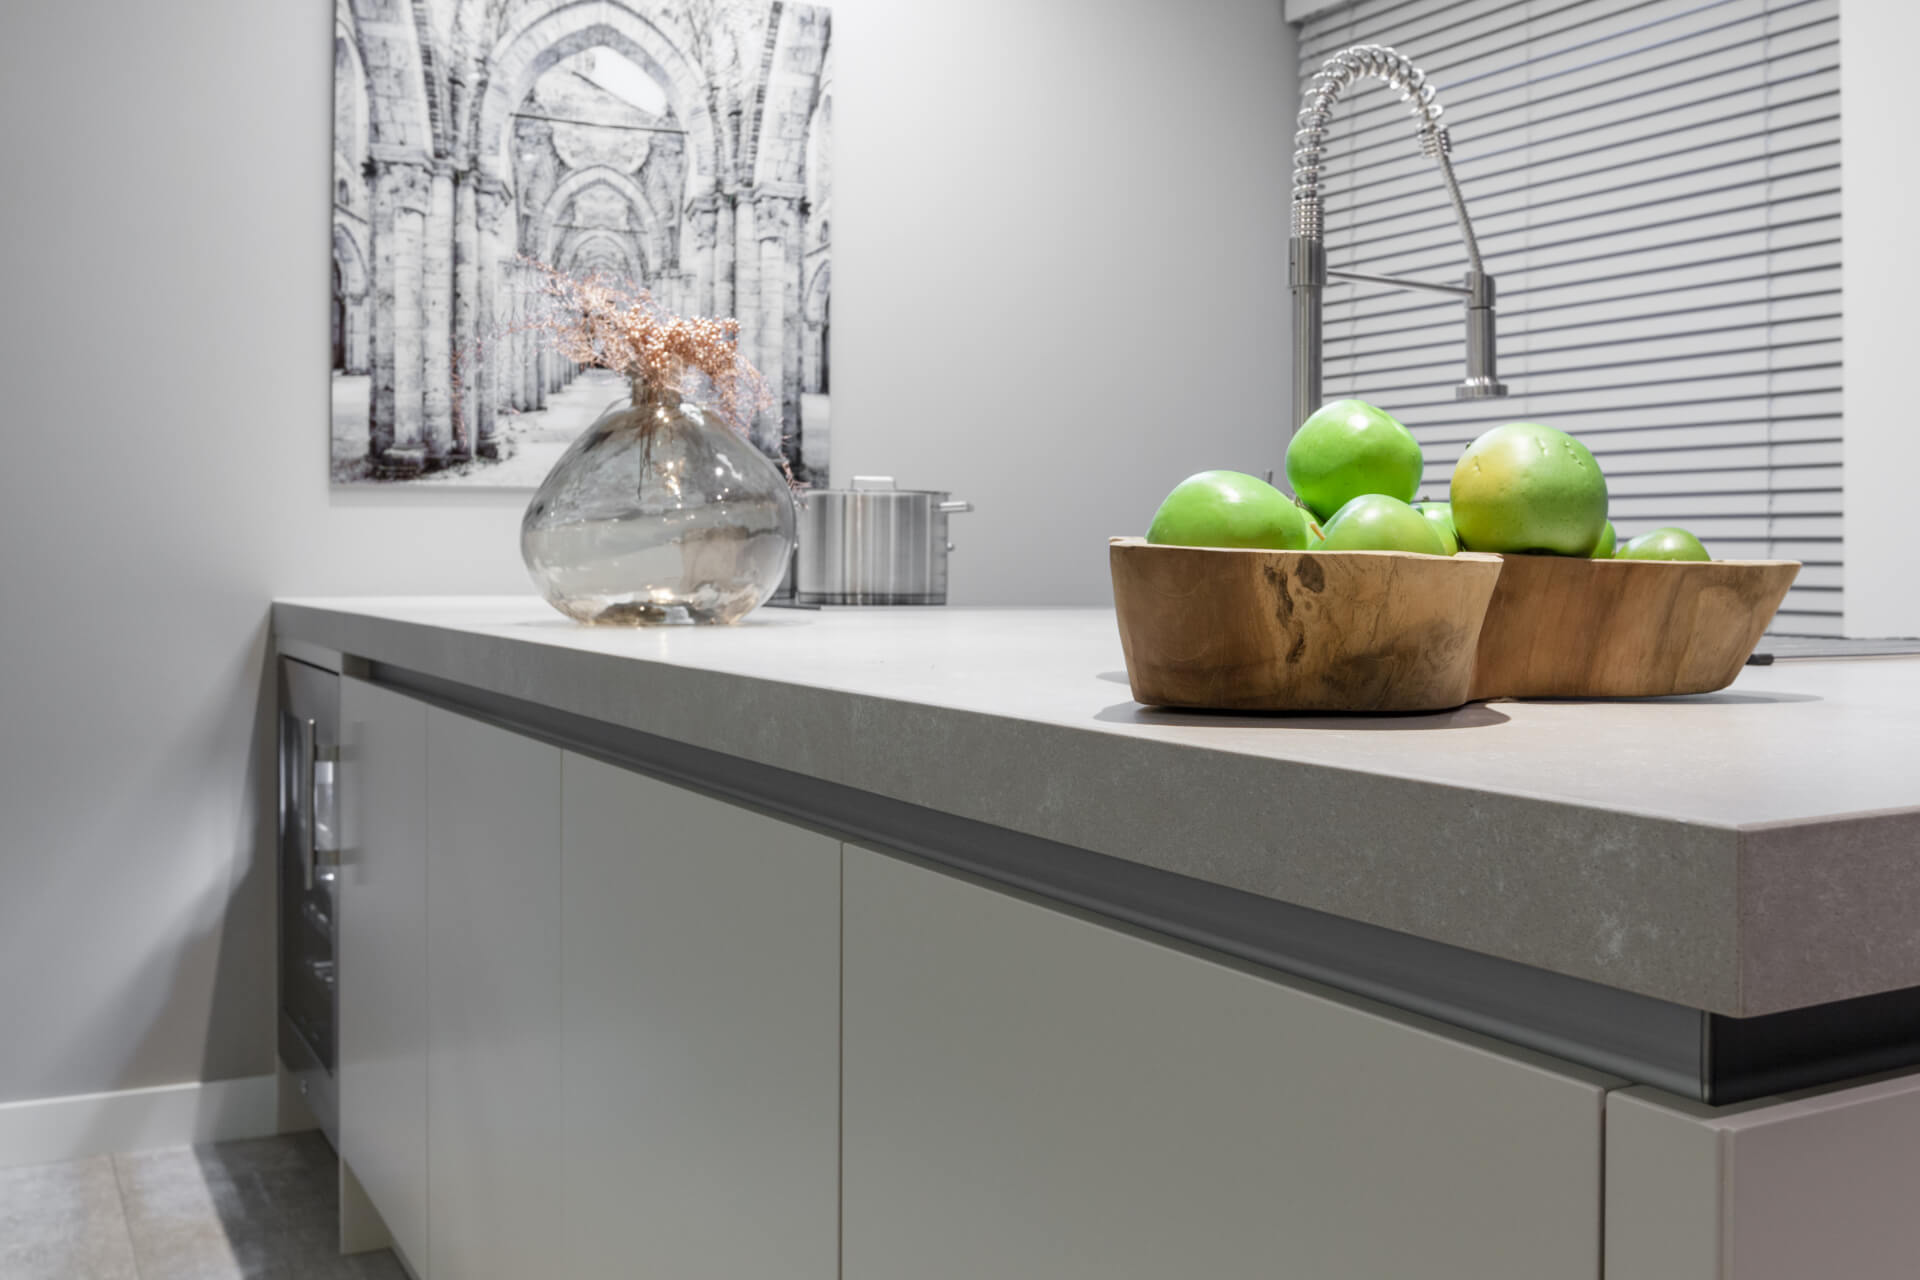 Greeploze keuken vol spannende contrasten | Barneveld